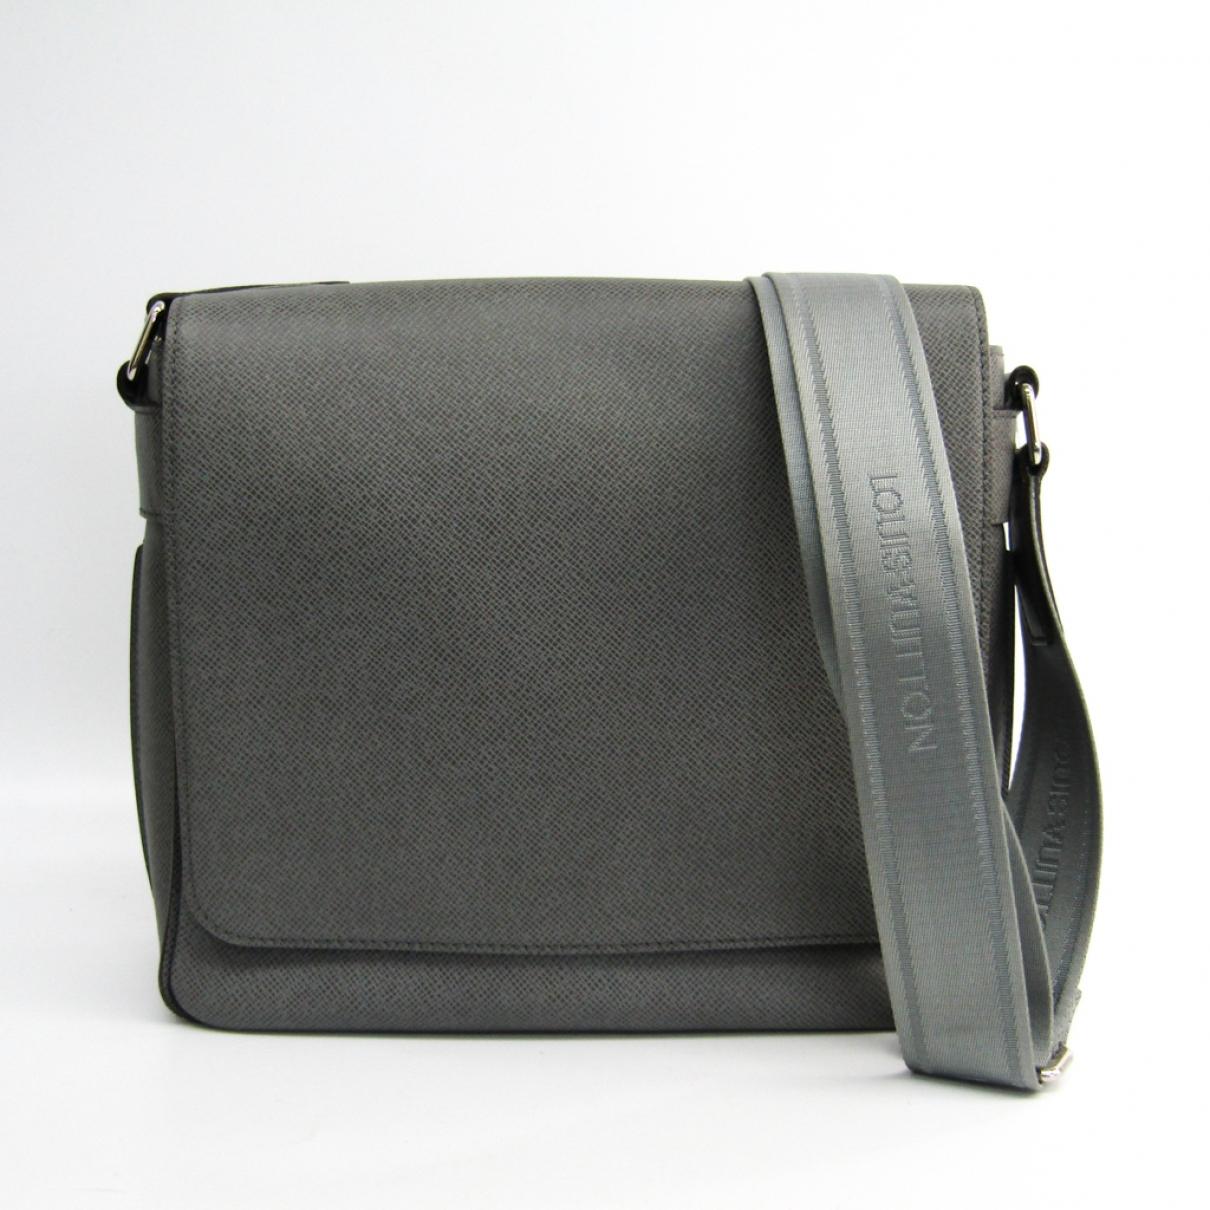 Louis Vuitton Roman Anthracite Cloth bag for Men \N